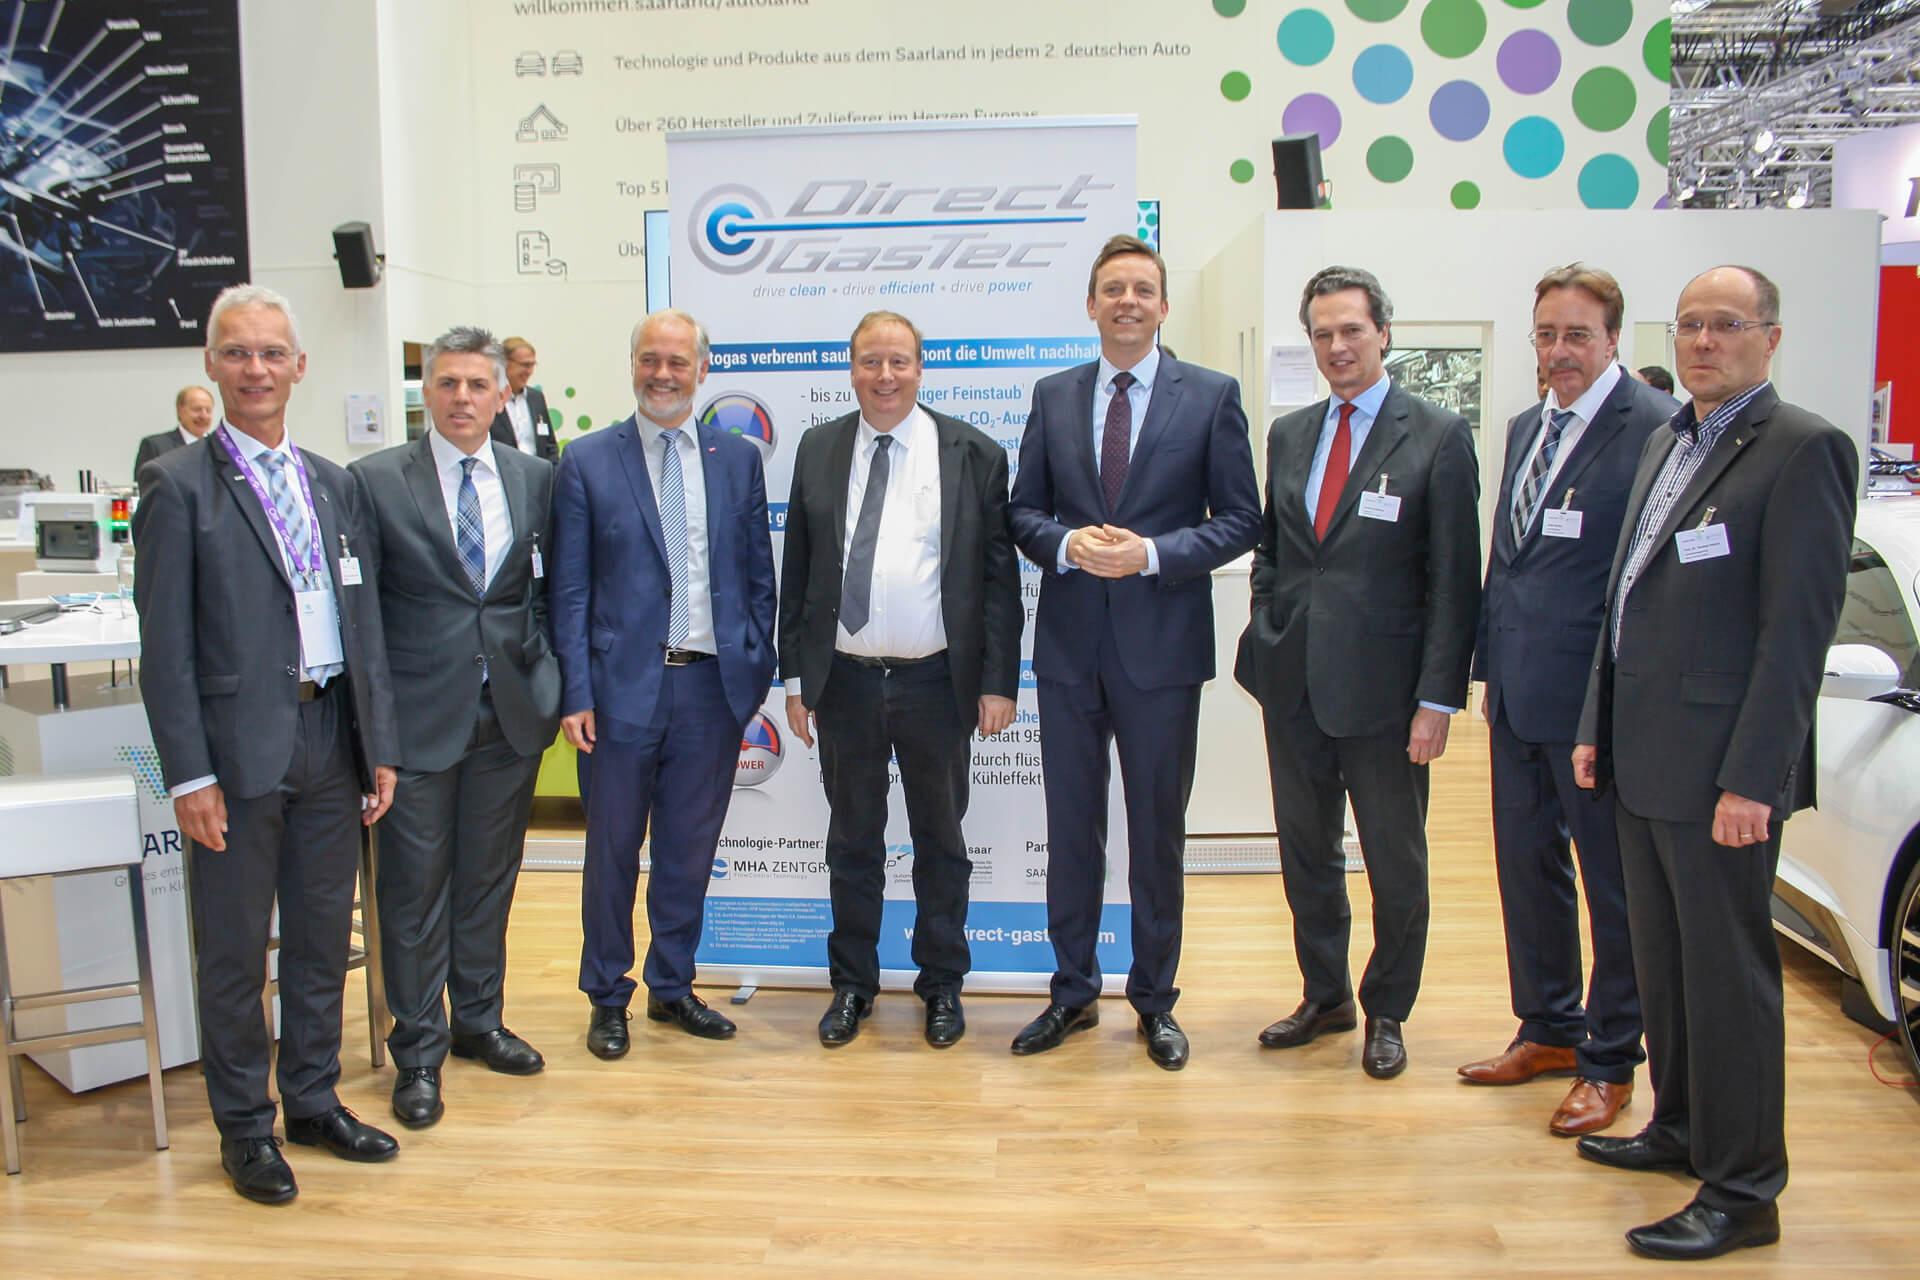 Impressionen der IAA 2019 in Frankfurt